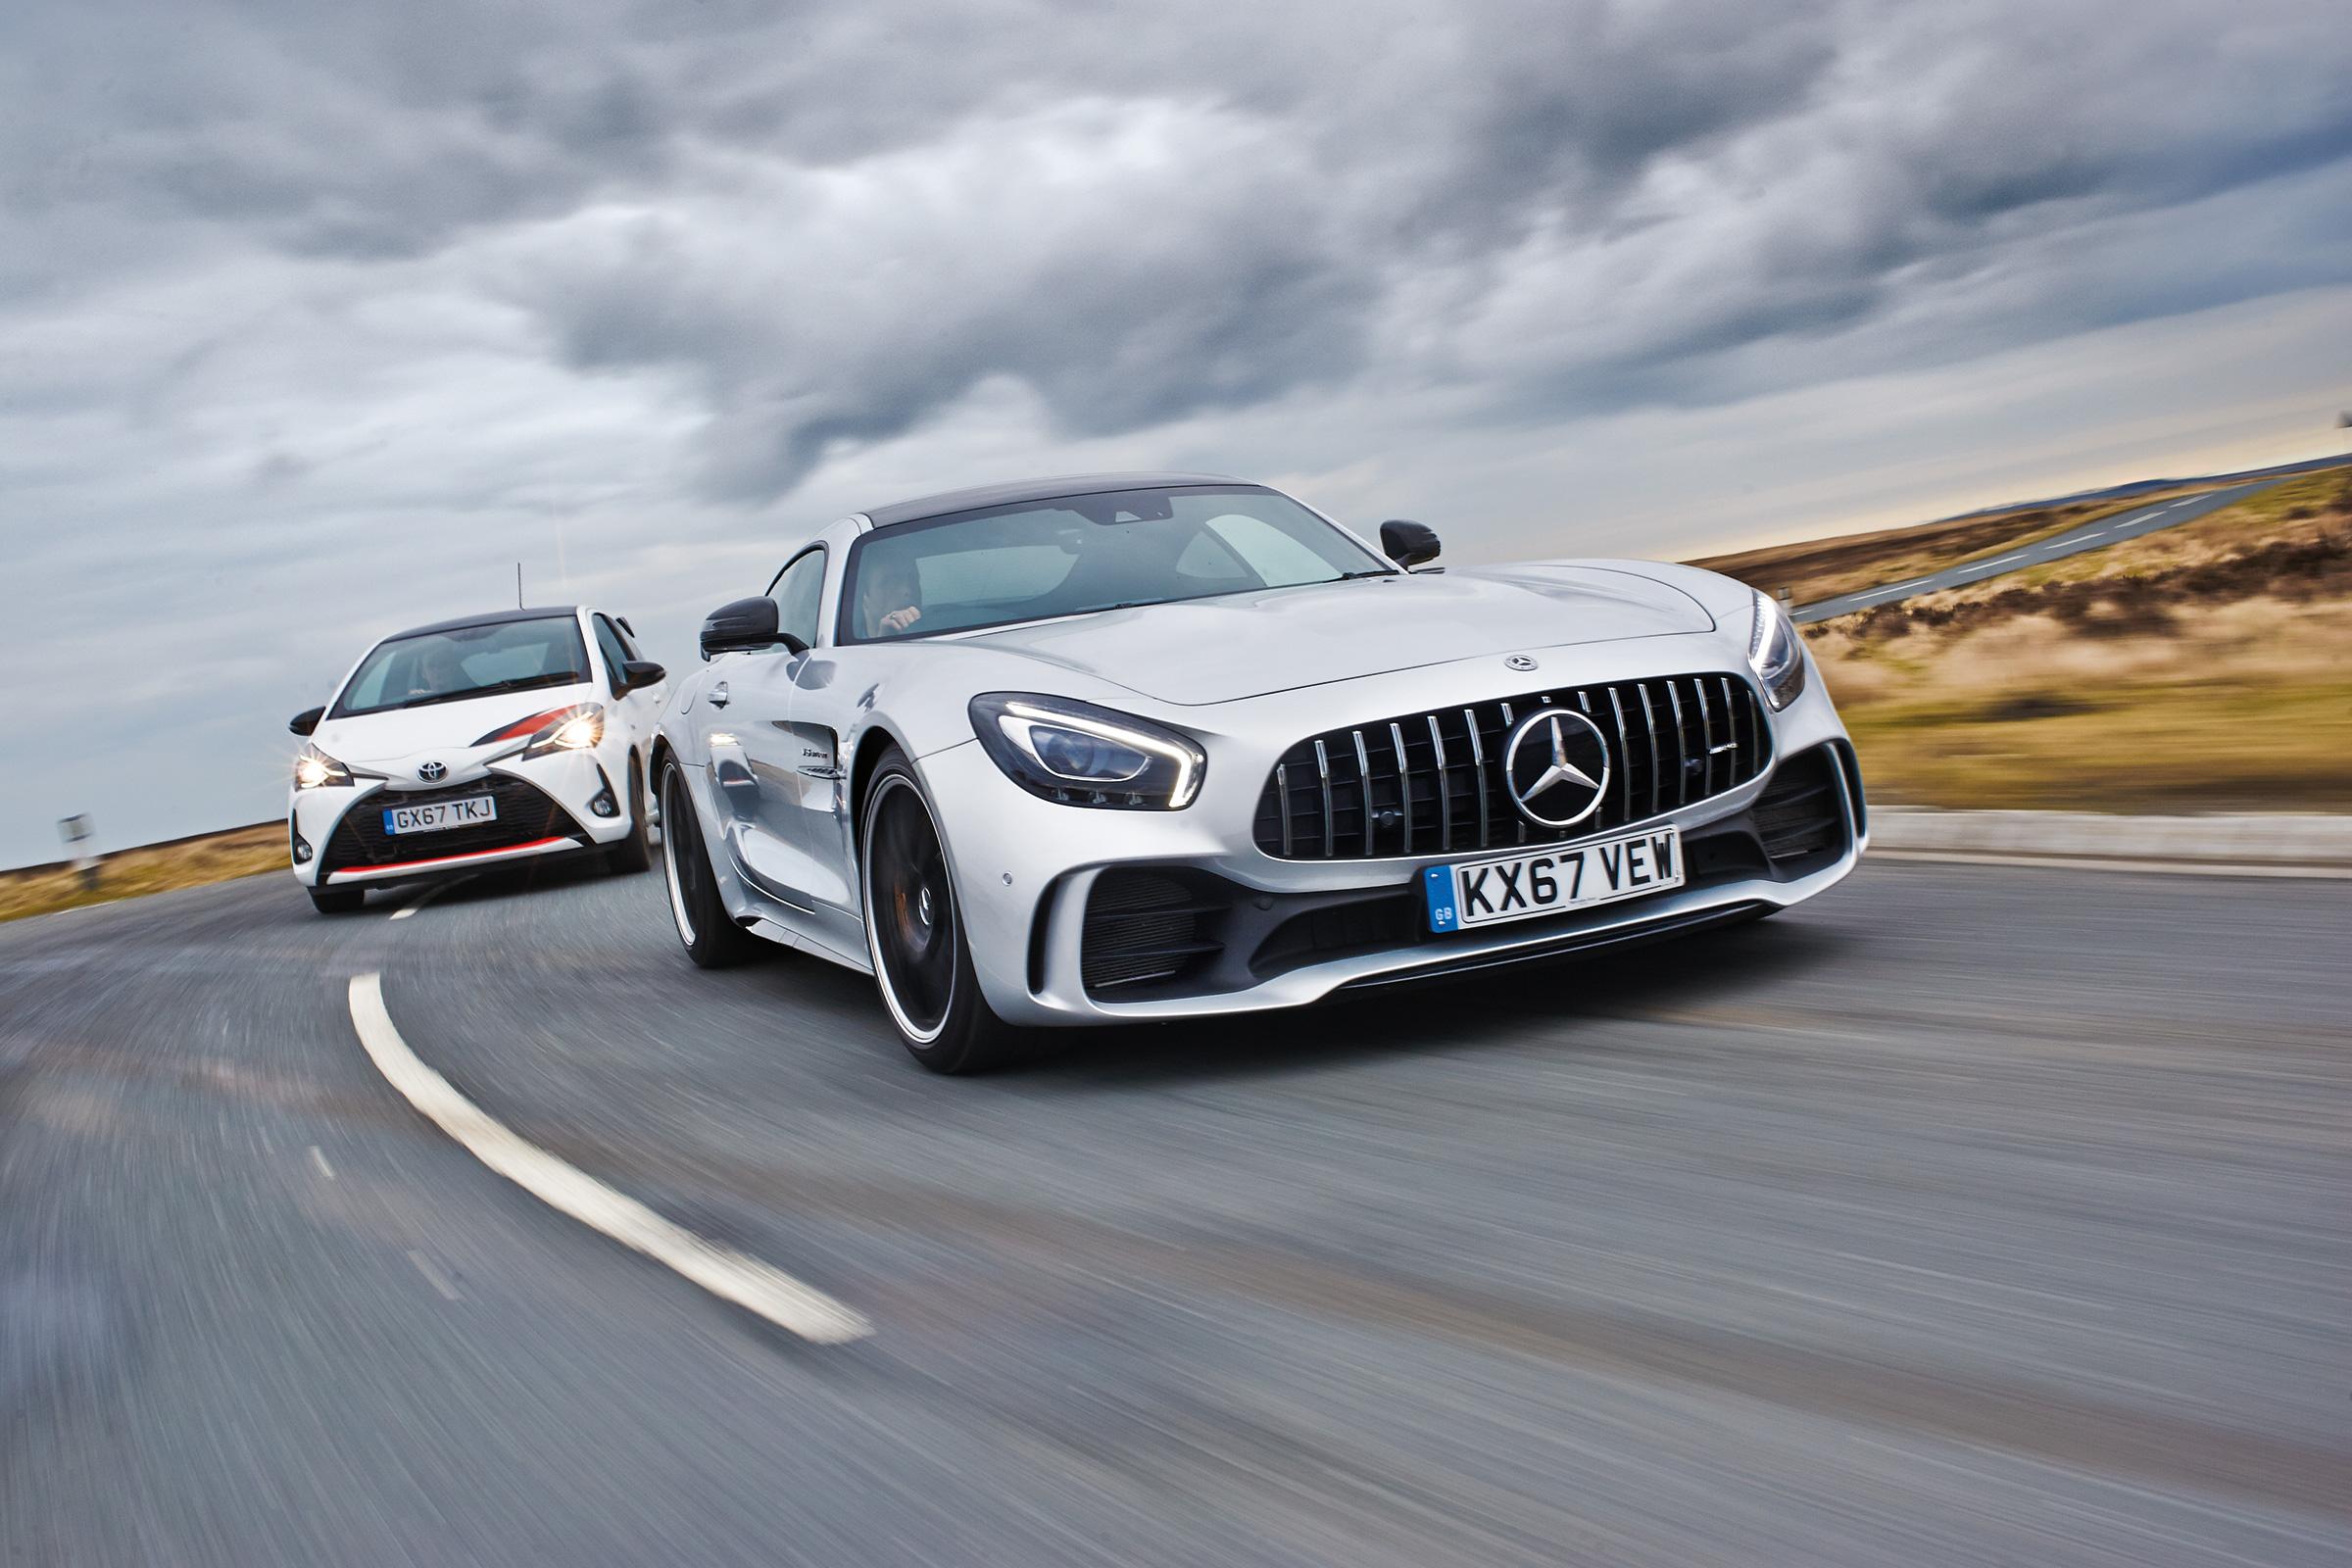 Little & large: Mercedes-AMG GT R vs Toyota Yaris GRMN | Evo